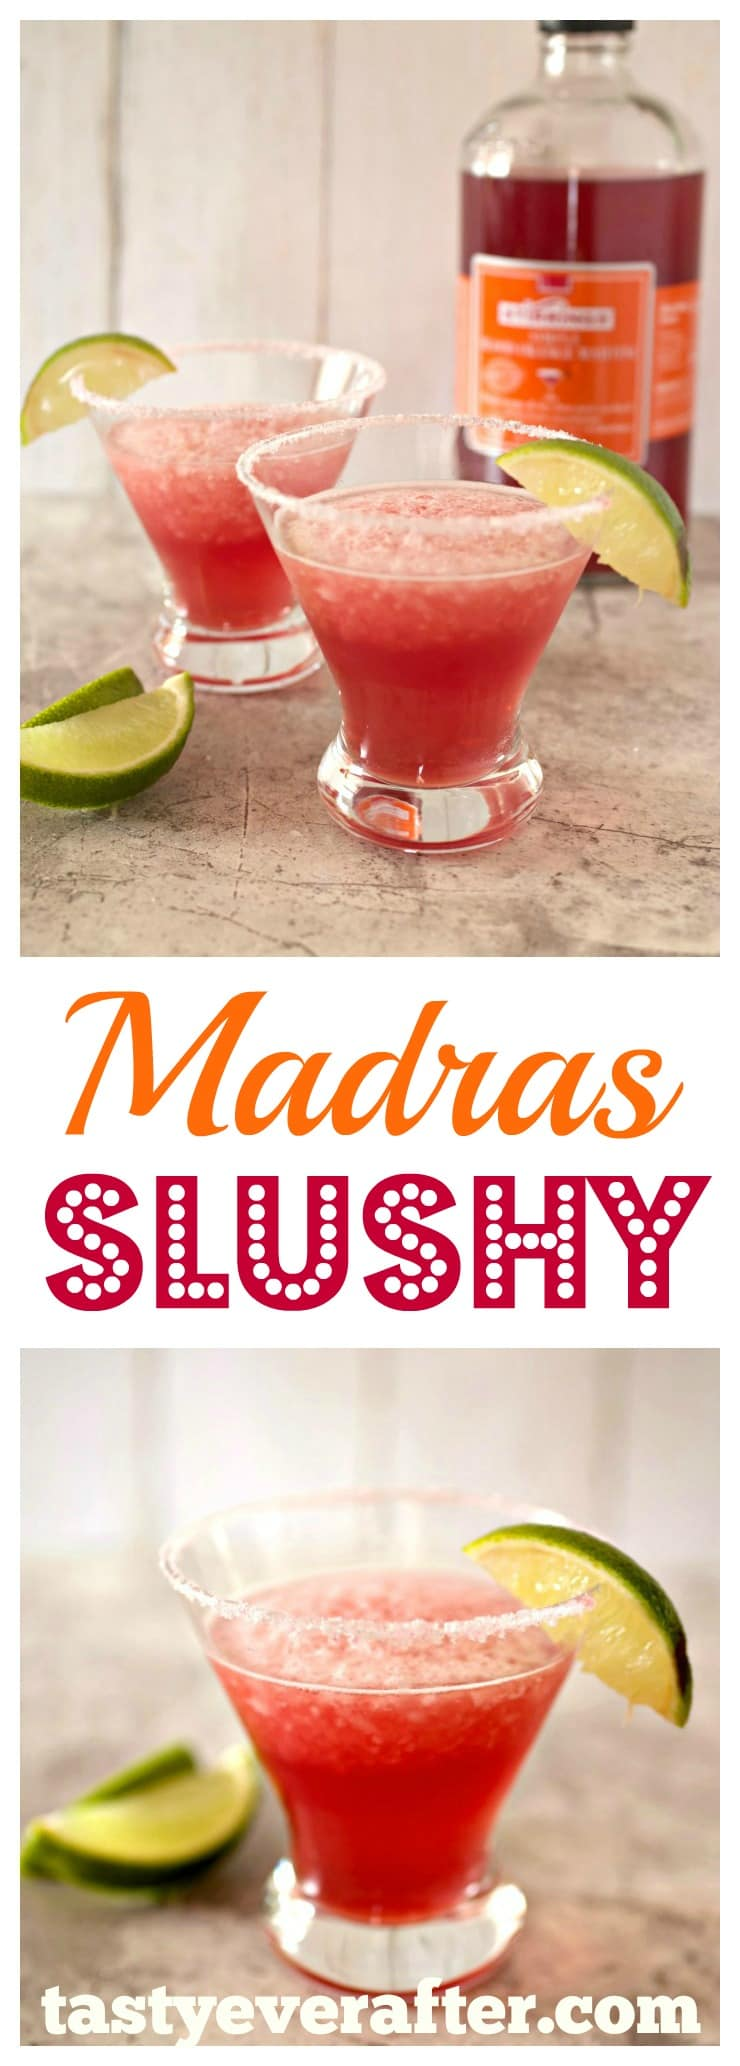 Madras Slushy